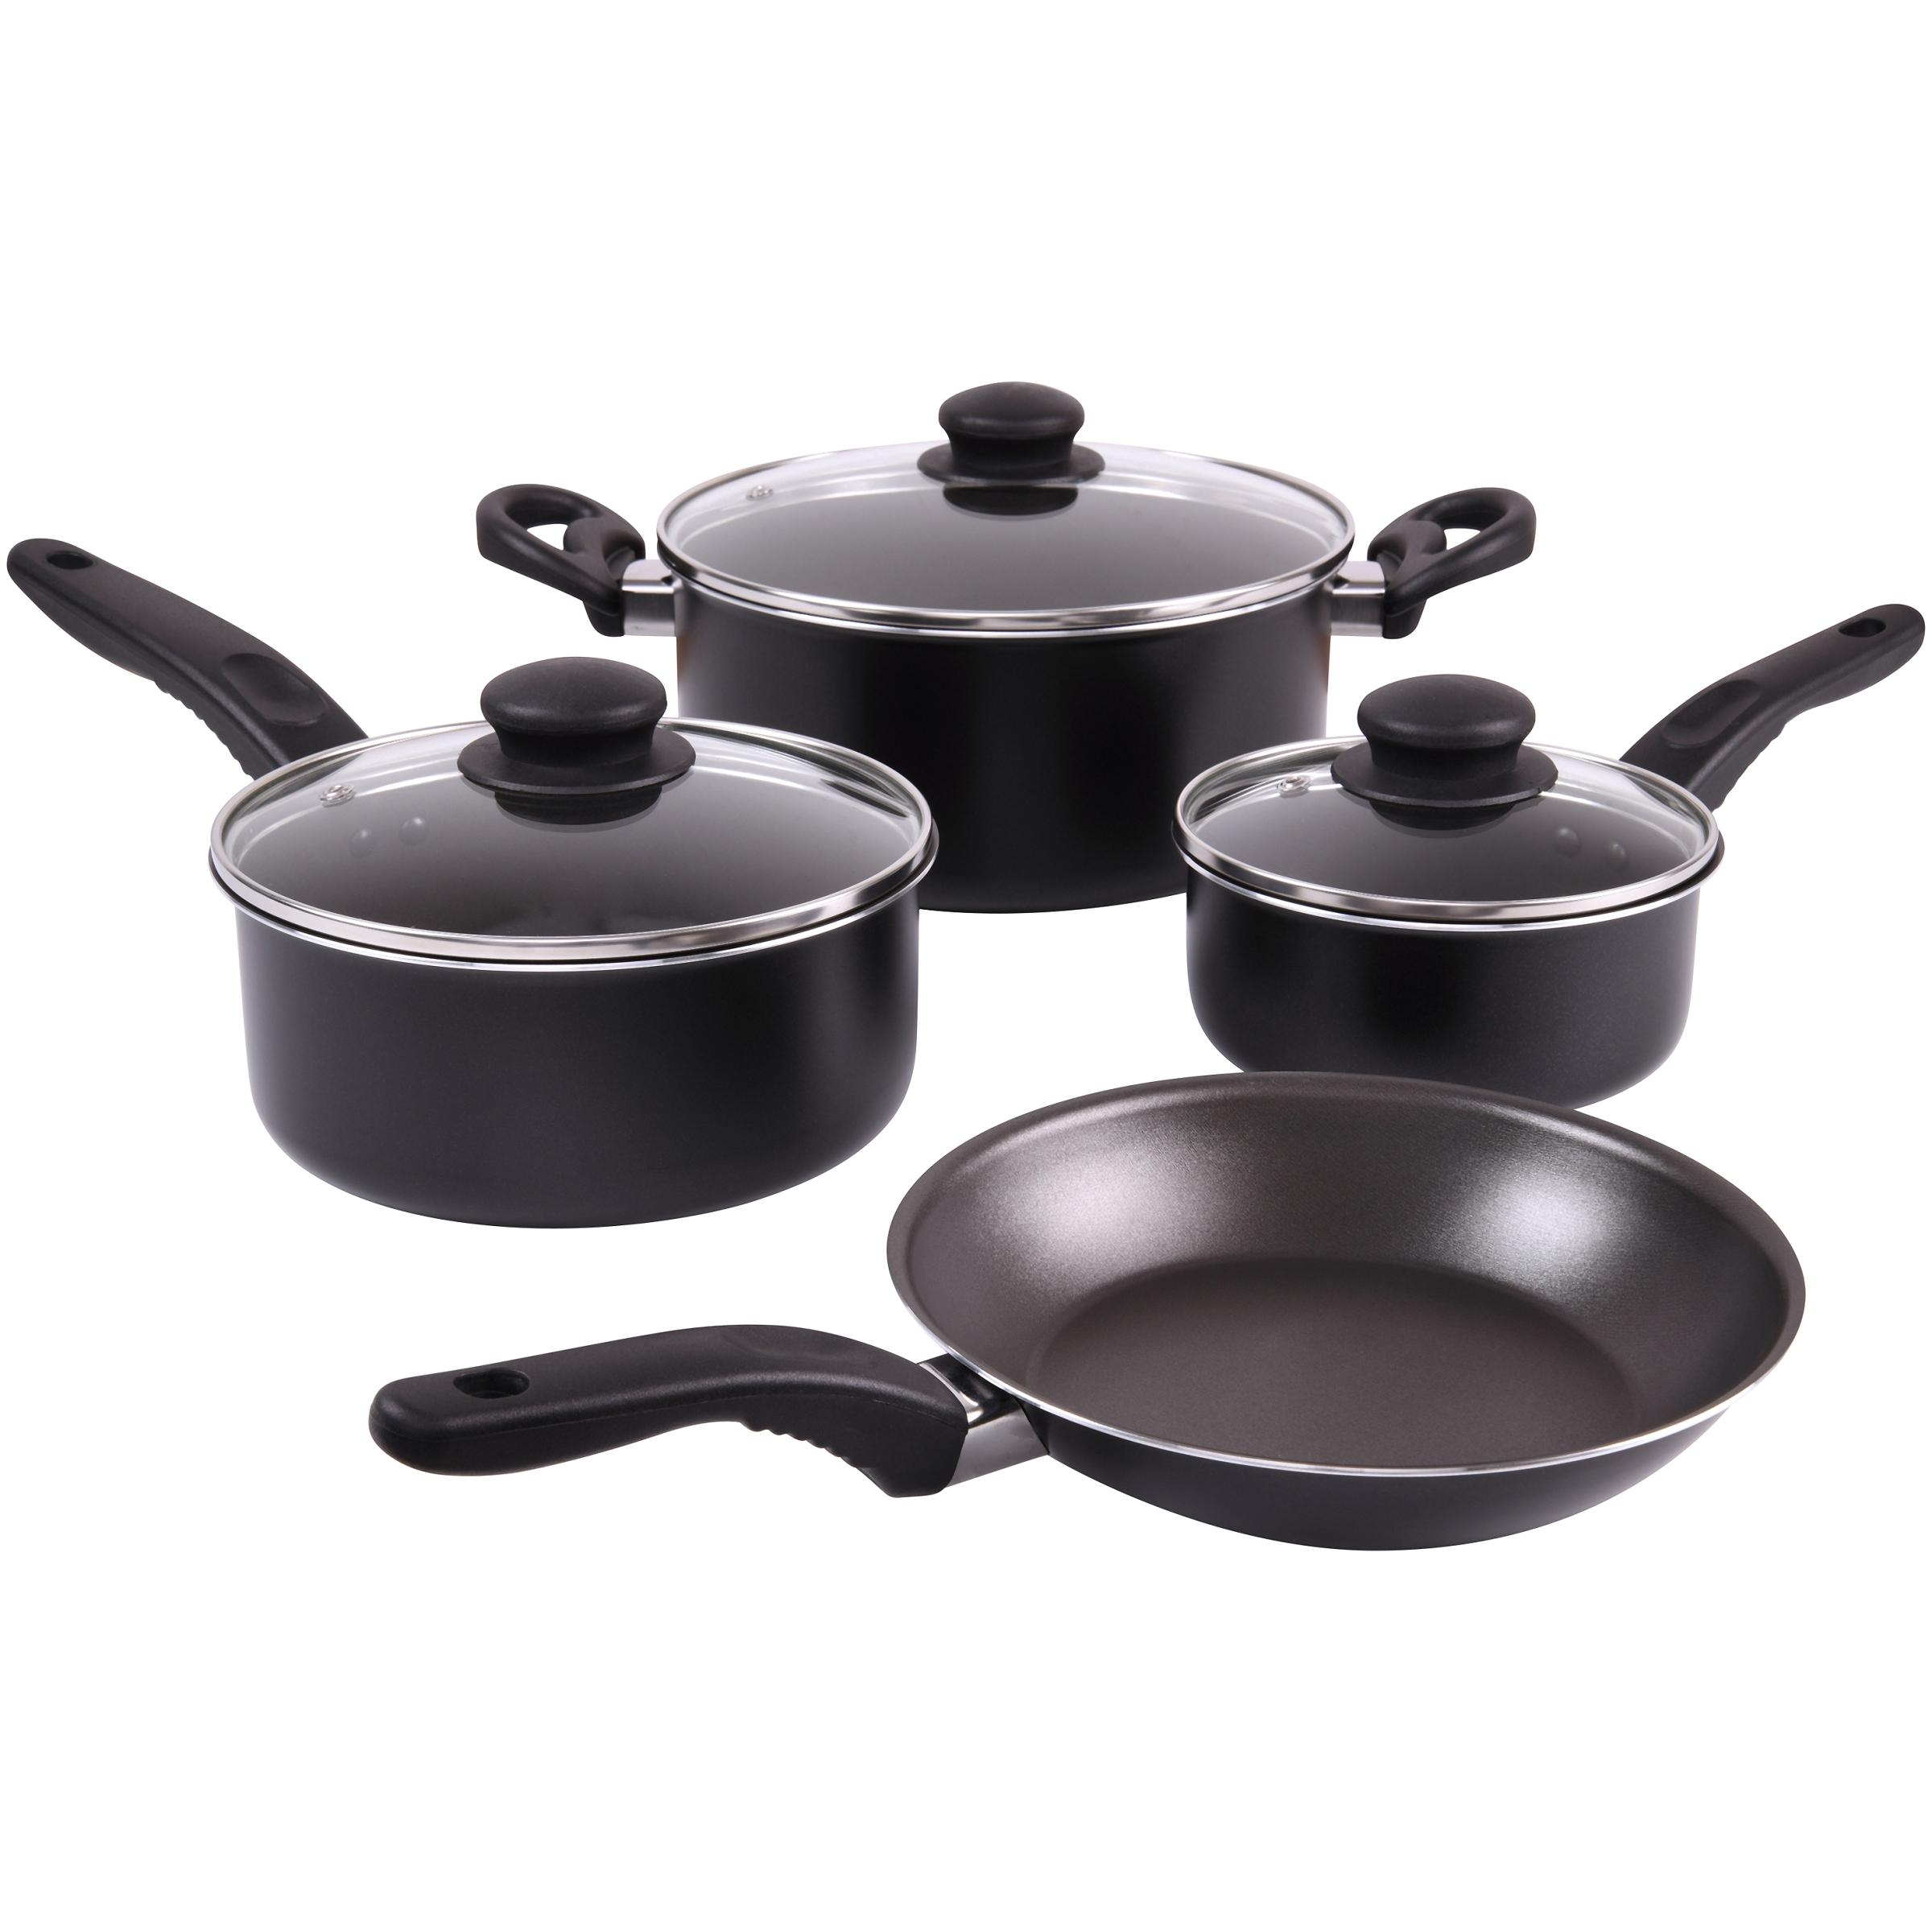 Mainstays 7 Pc Aluminum Cookware Set  Only $14.94 (Reg $25.50) + Free Store Pickup at Walmart.com!